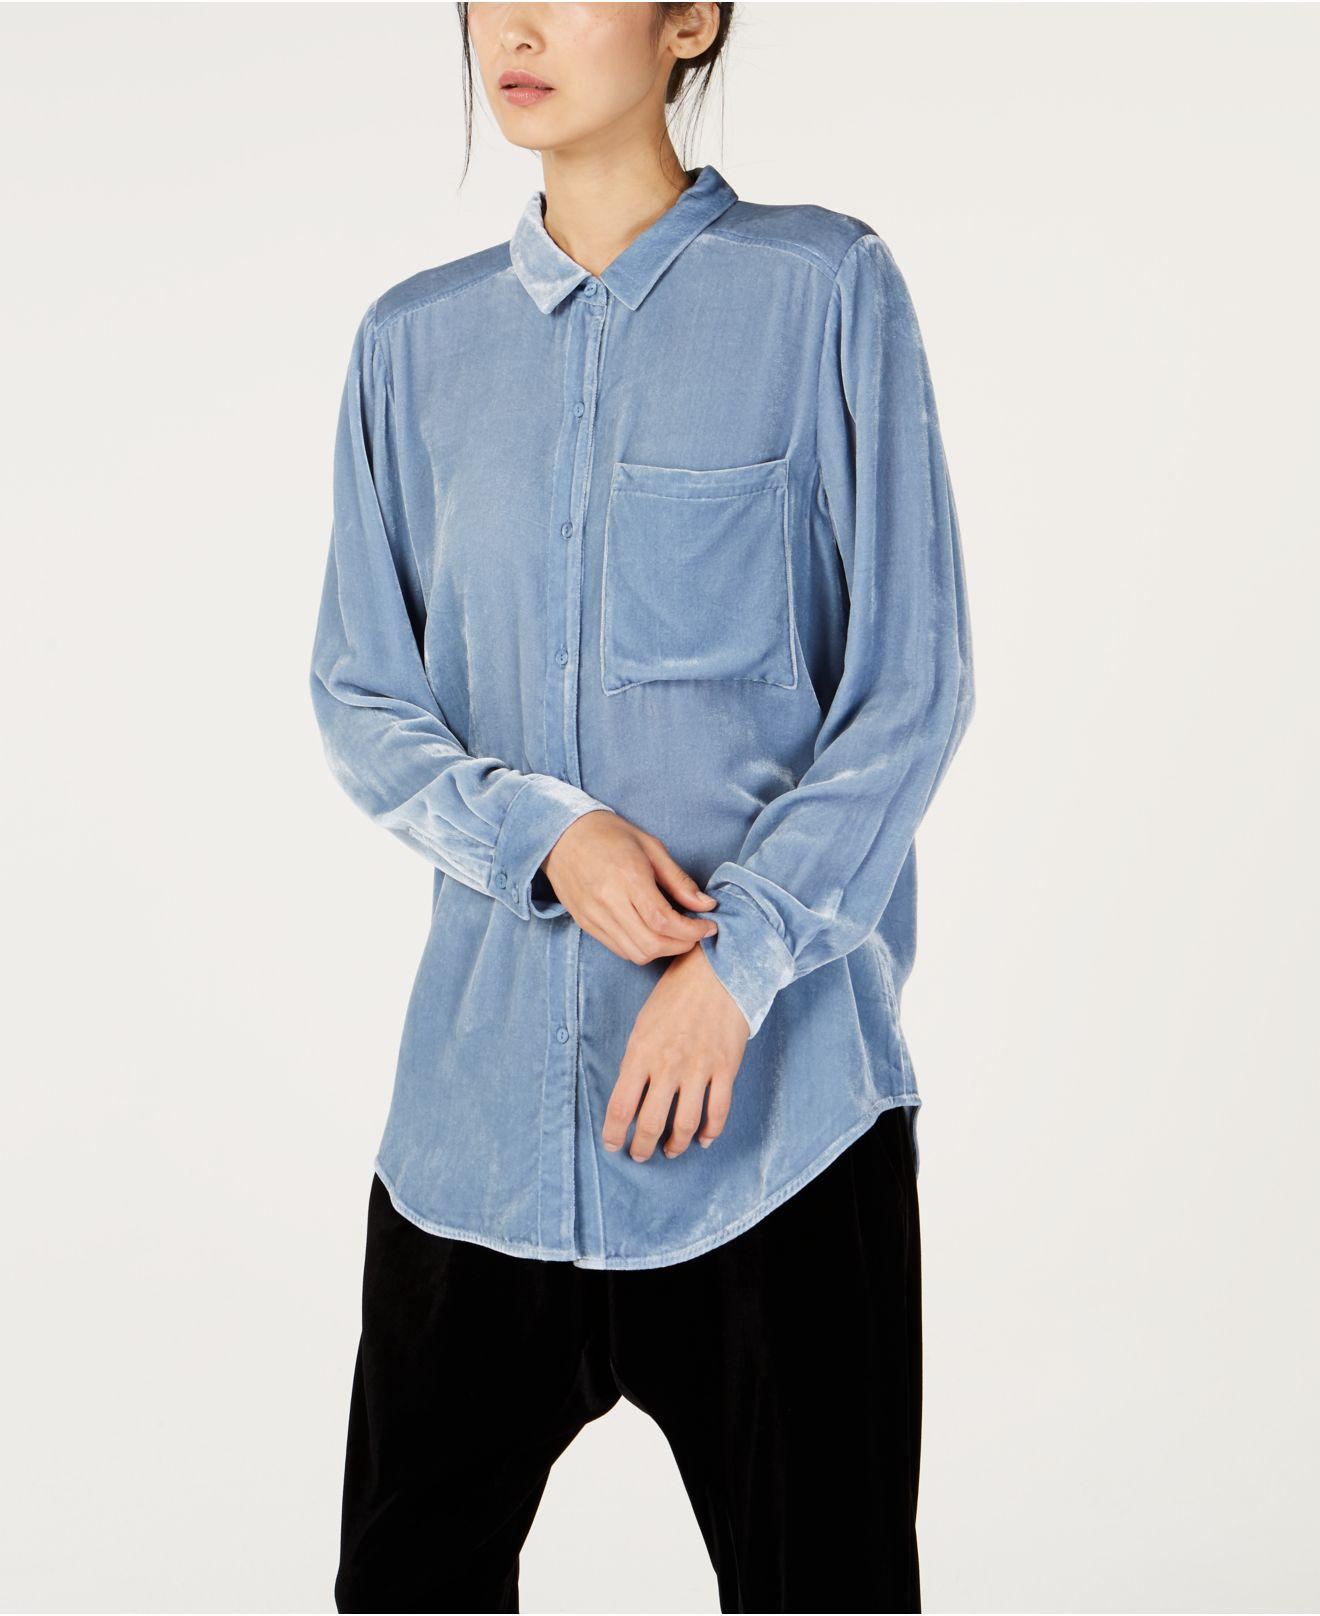 4e8c1787153f1 Lyst - Eileen Fisher Velvet Button-up Shirt